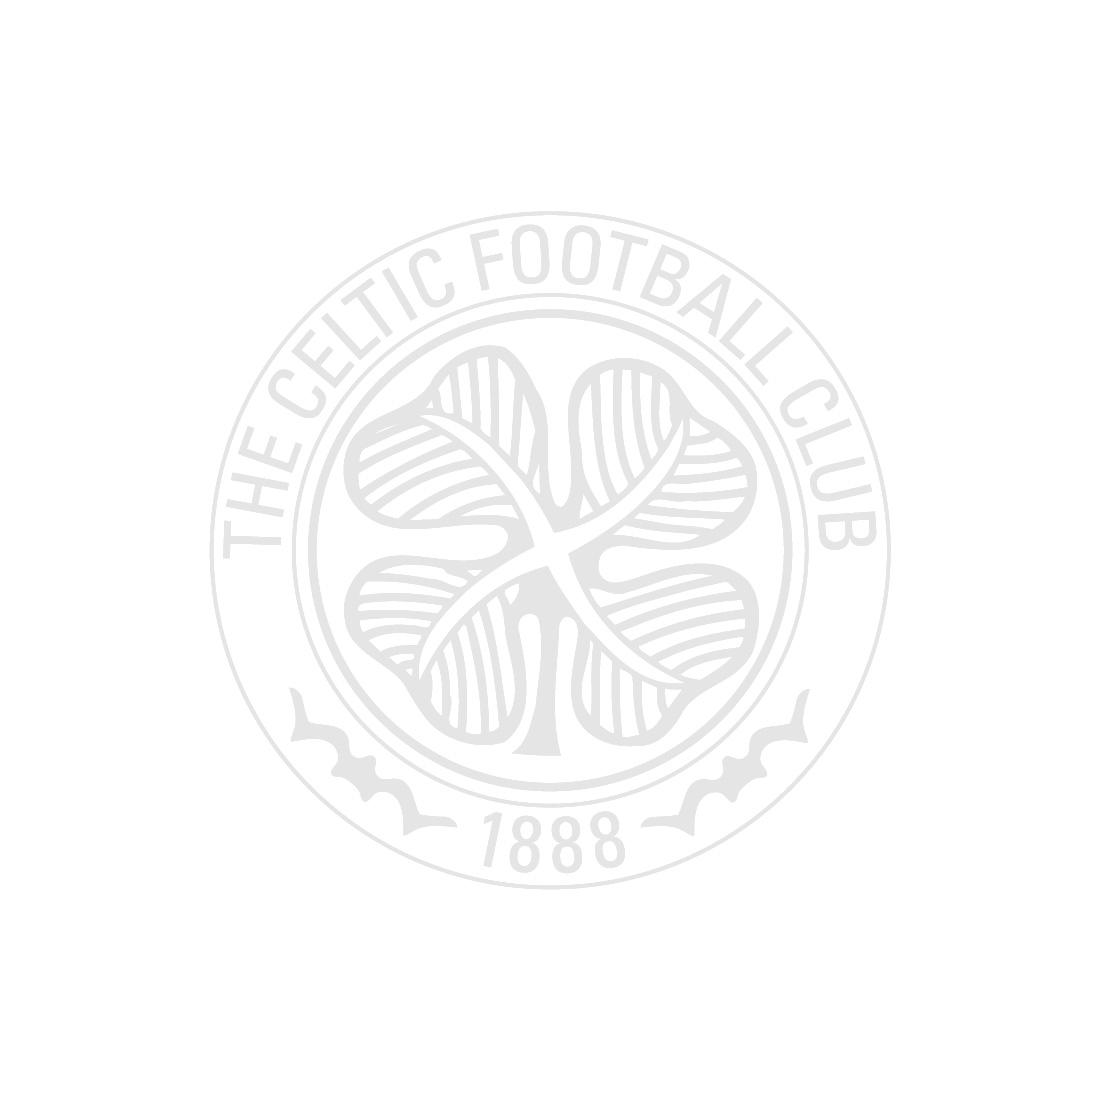 Celtic Junior Hailey Mascot T-shirt